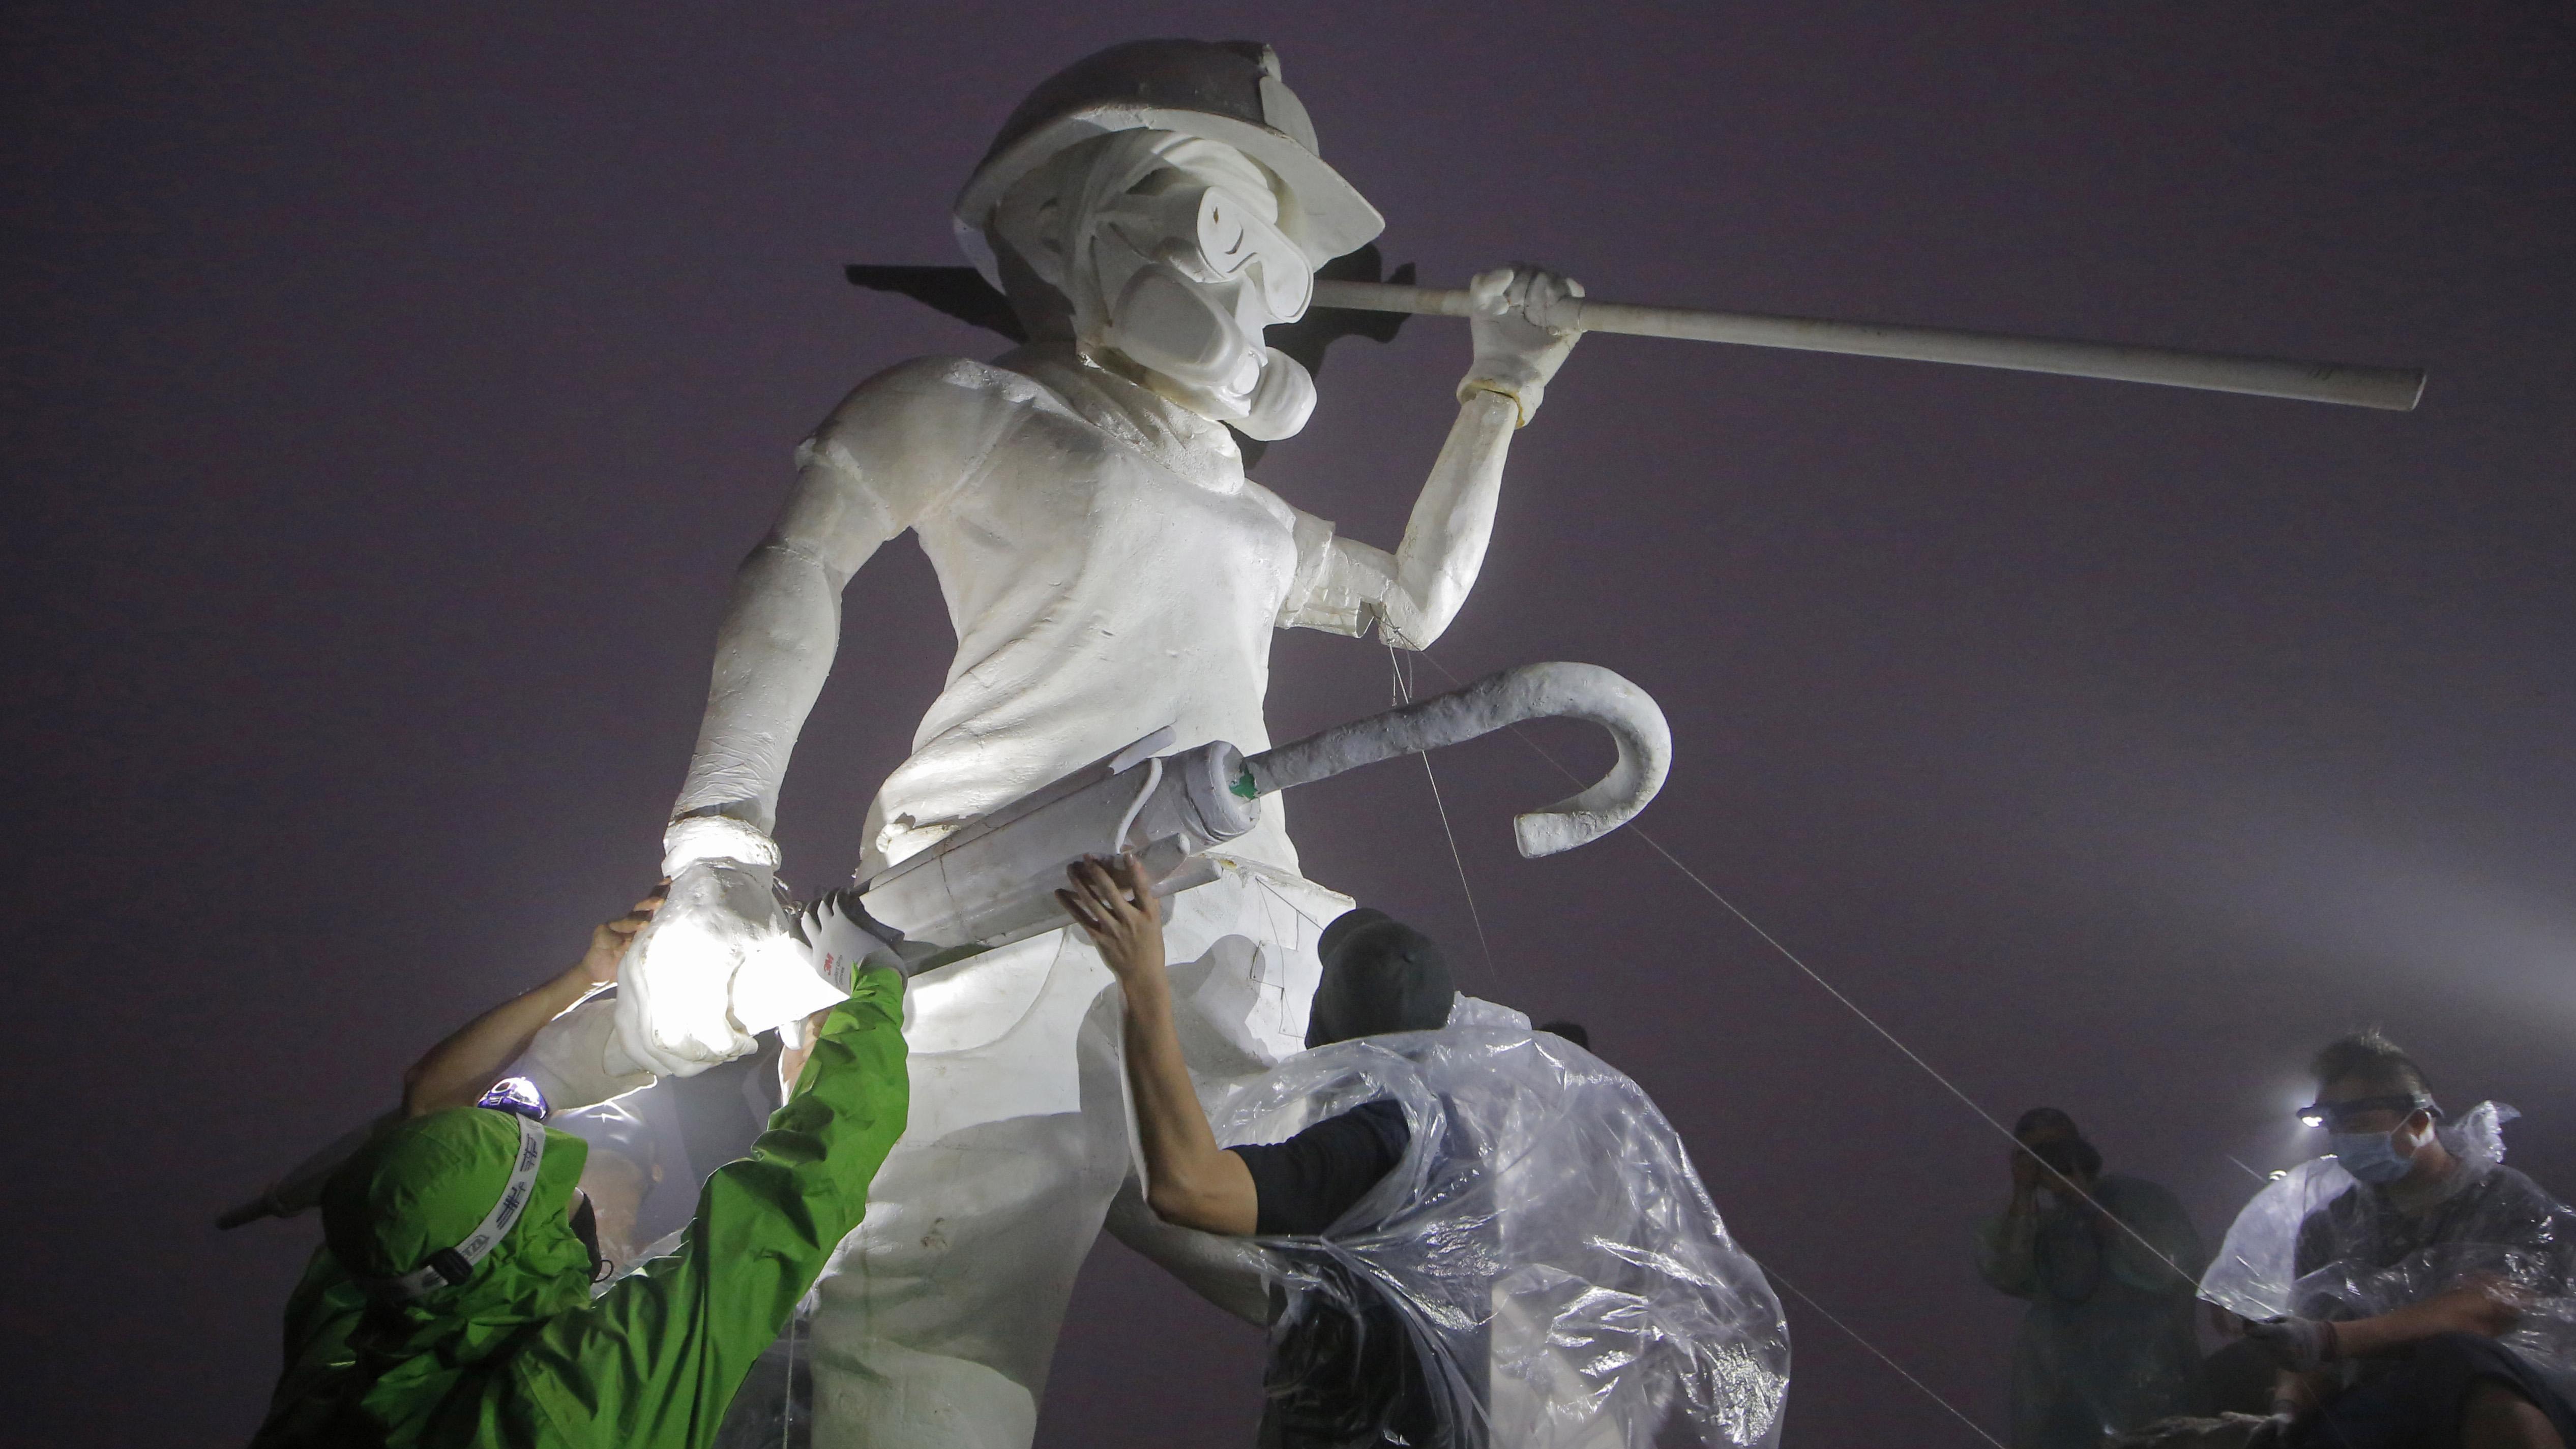 Manifestantes erigen una estatua en la cima de la montaña de Hong Kong